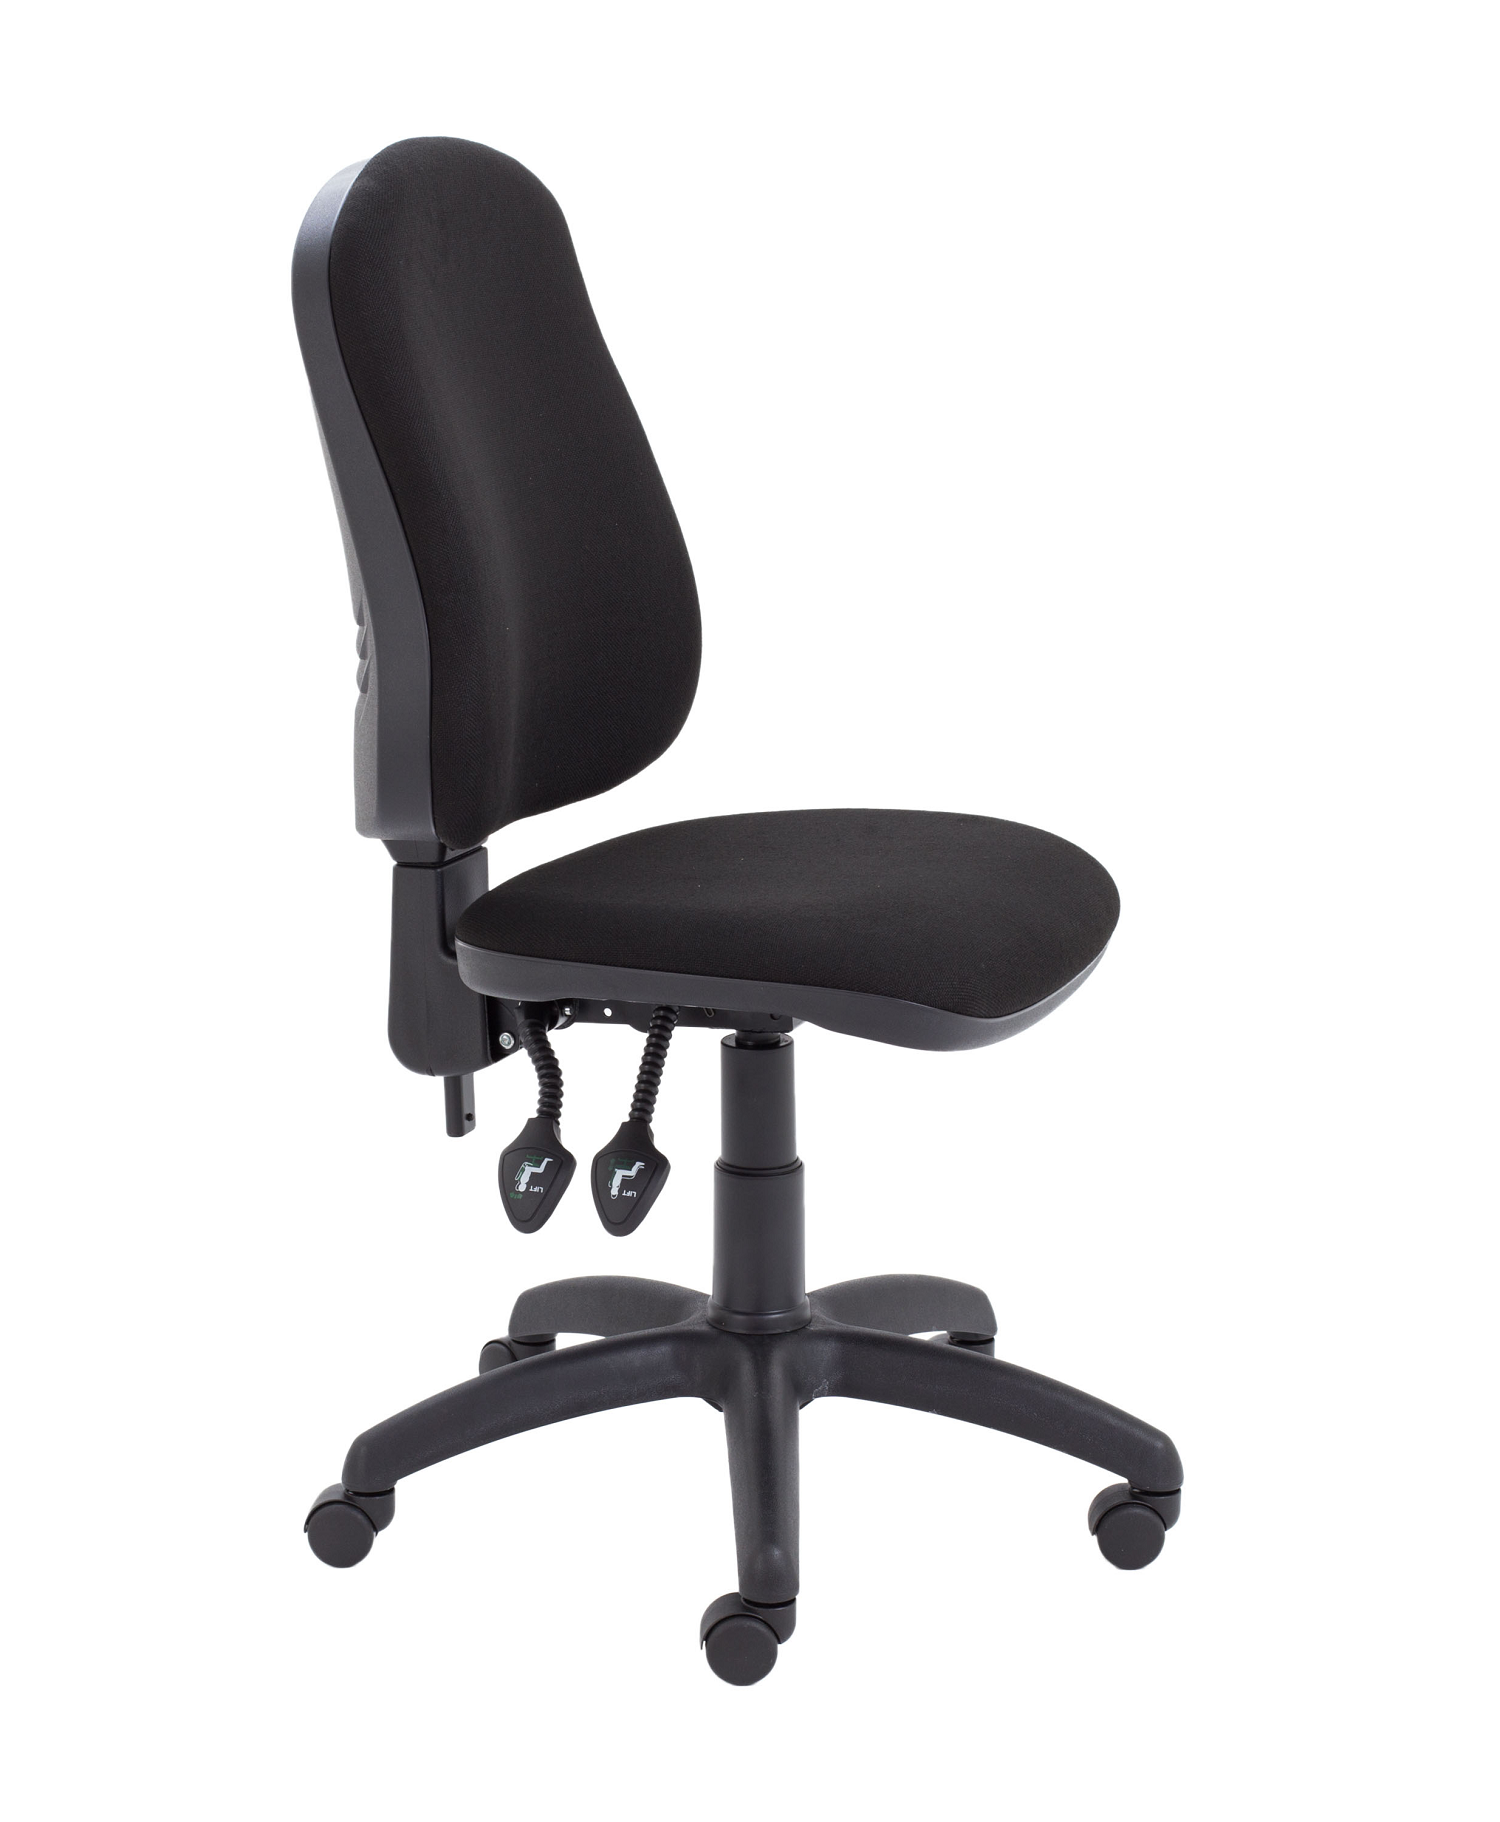 Calypso II High Back Office Chair (CH2800BK)